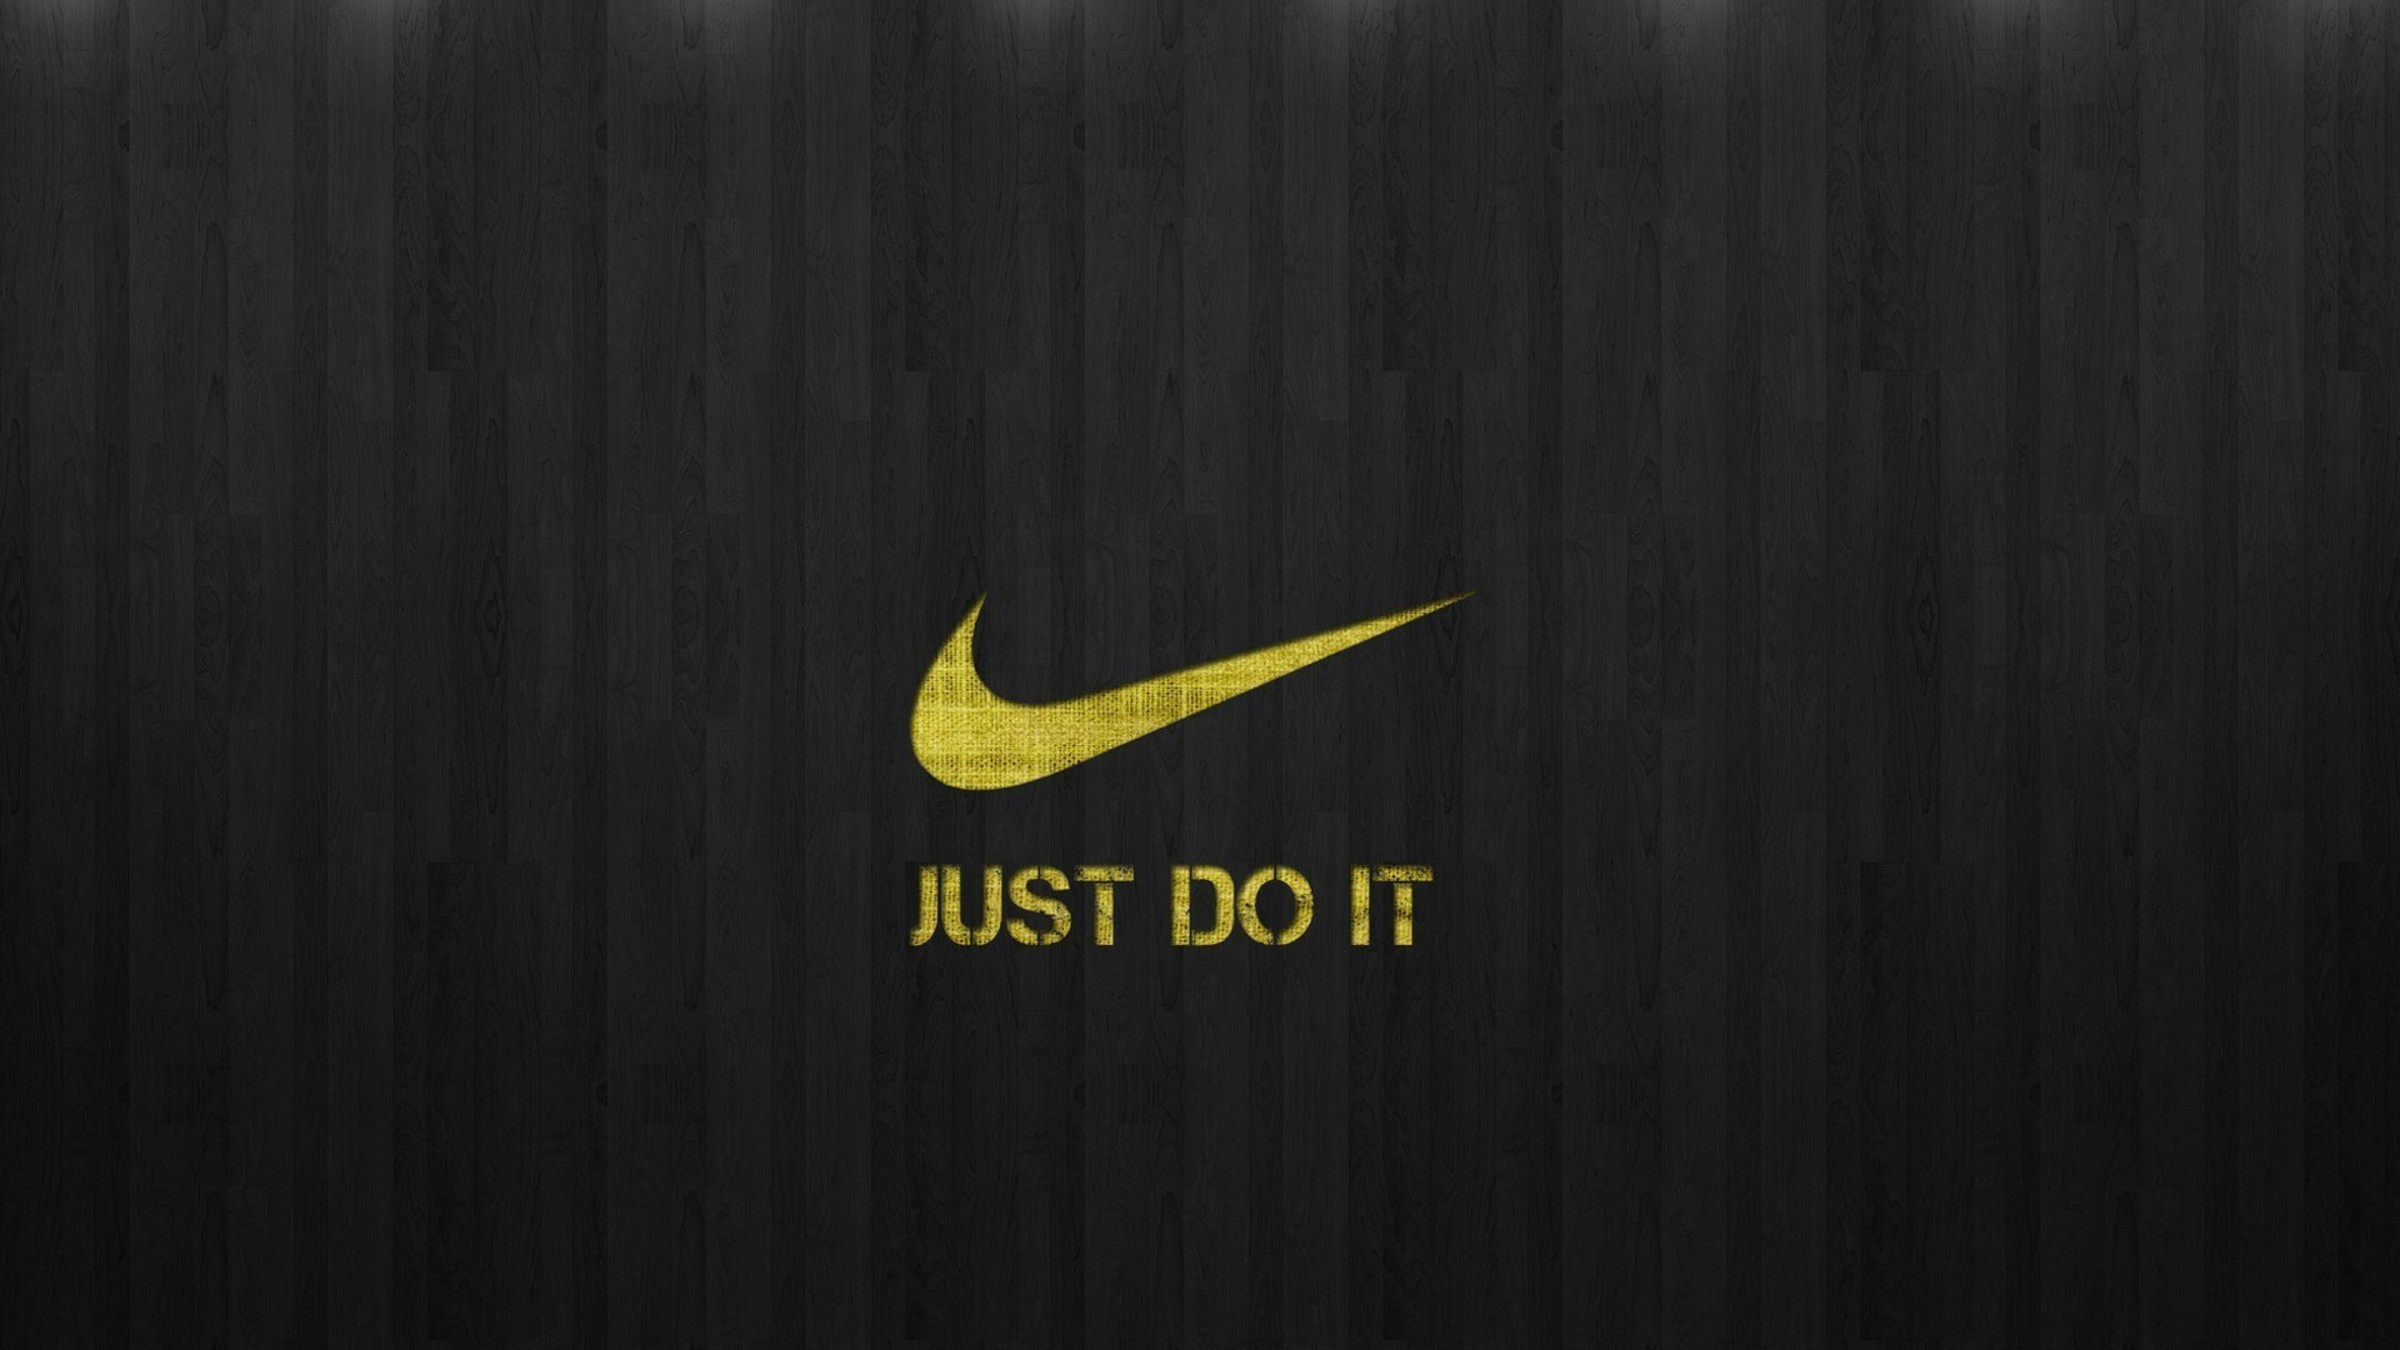 Res: 2400x1350, Just do it nike Marken logos Sport